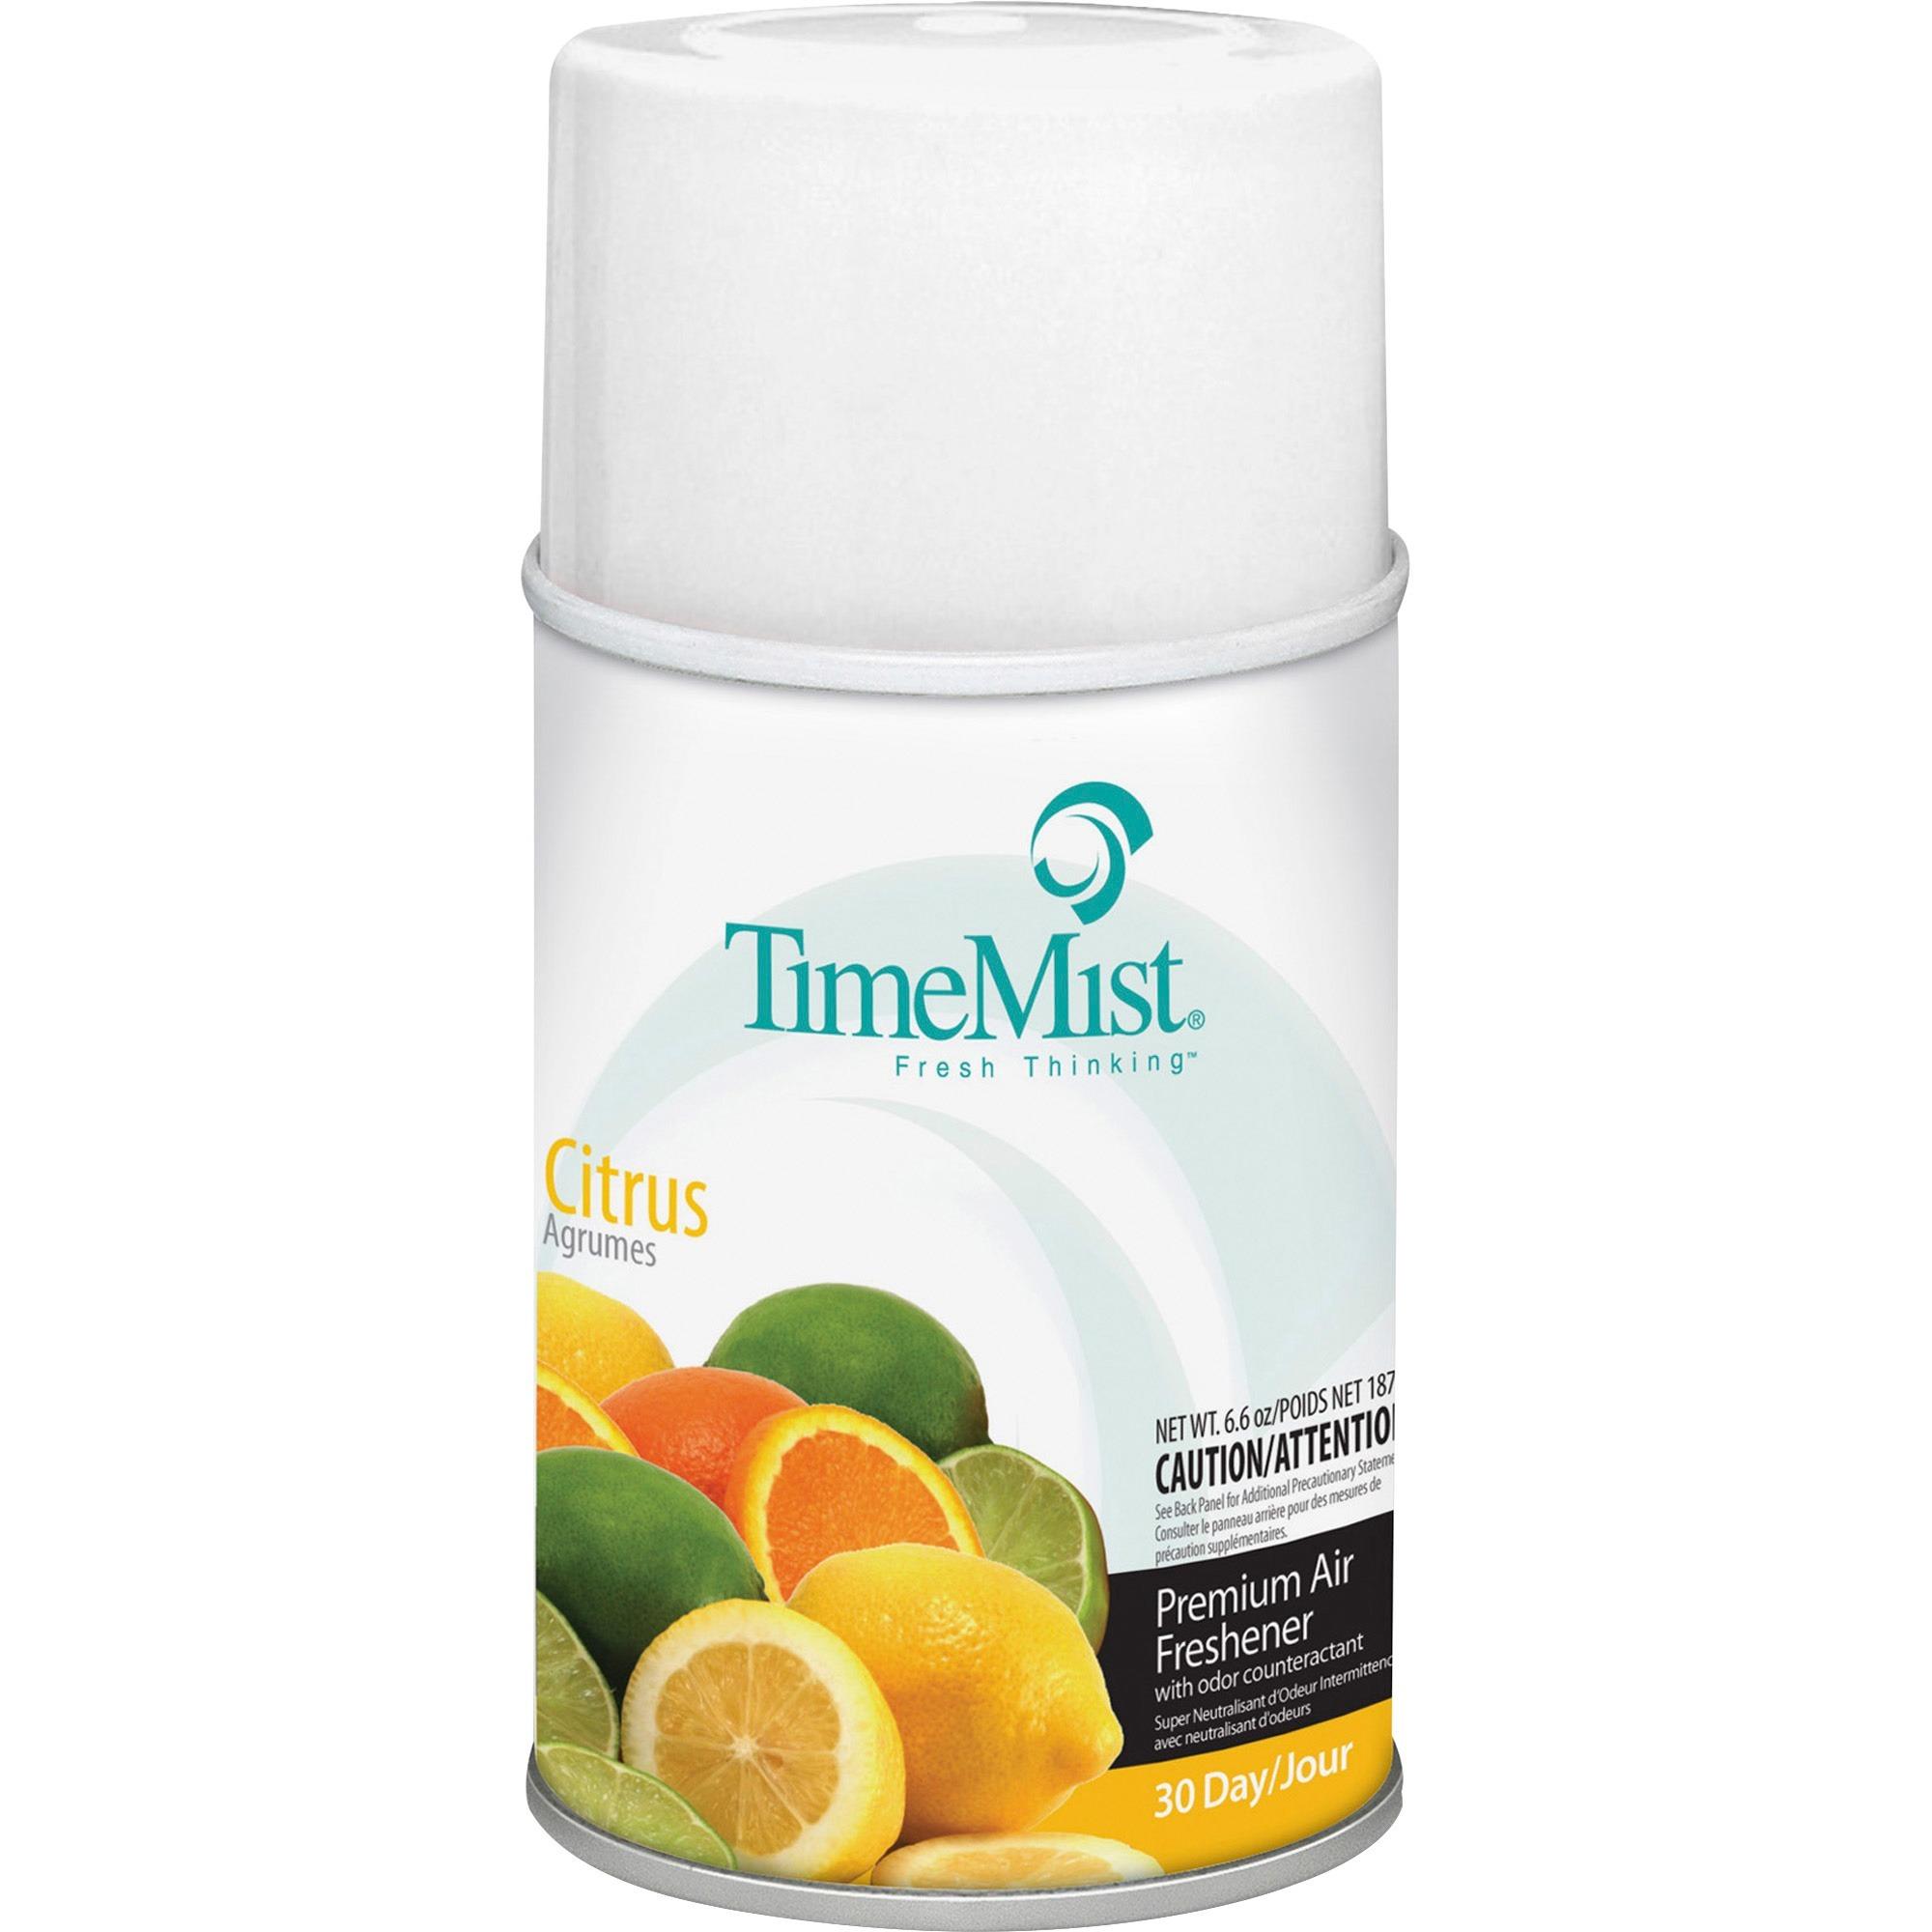 TimeMist, TMS1042781CT, Metered Dispenser Citrus Scent Refill, 12 / Carton, Clear